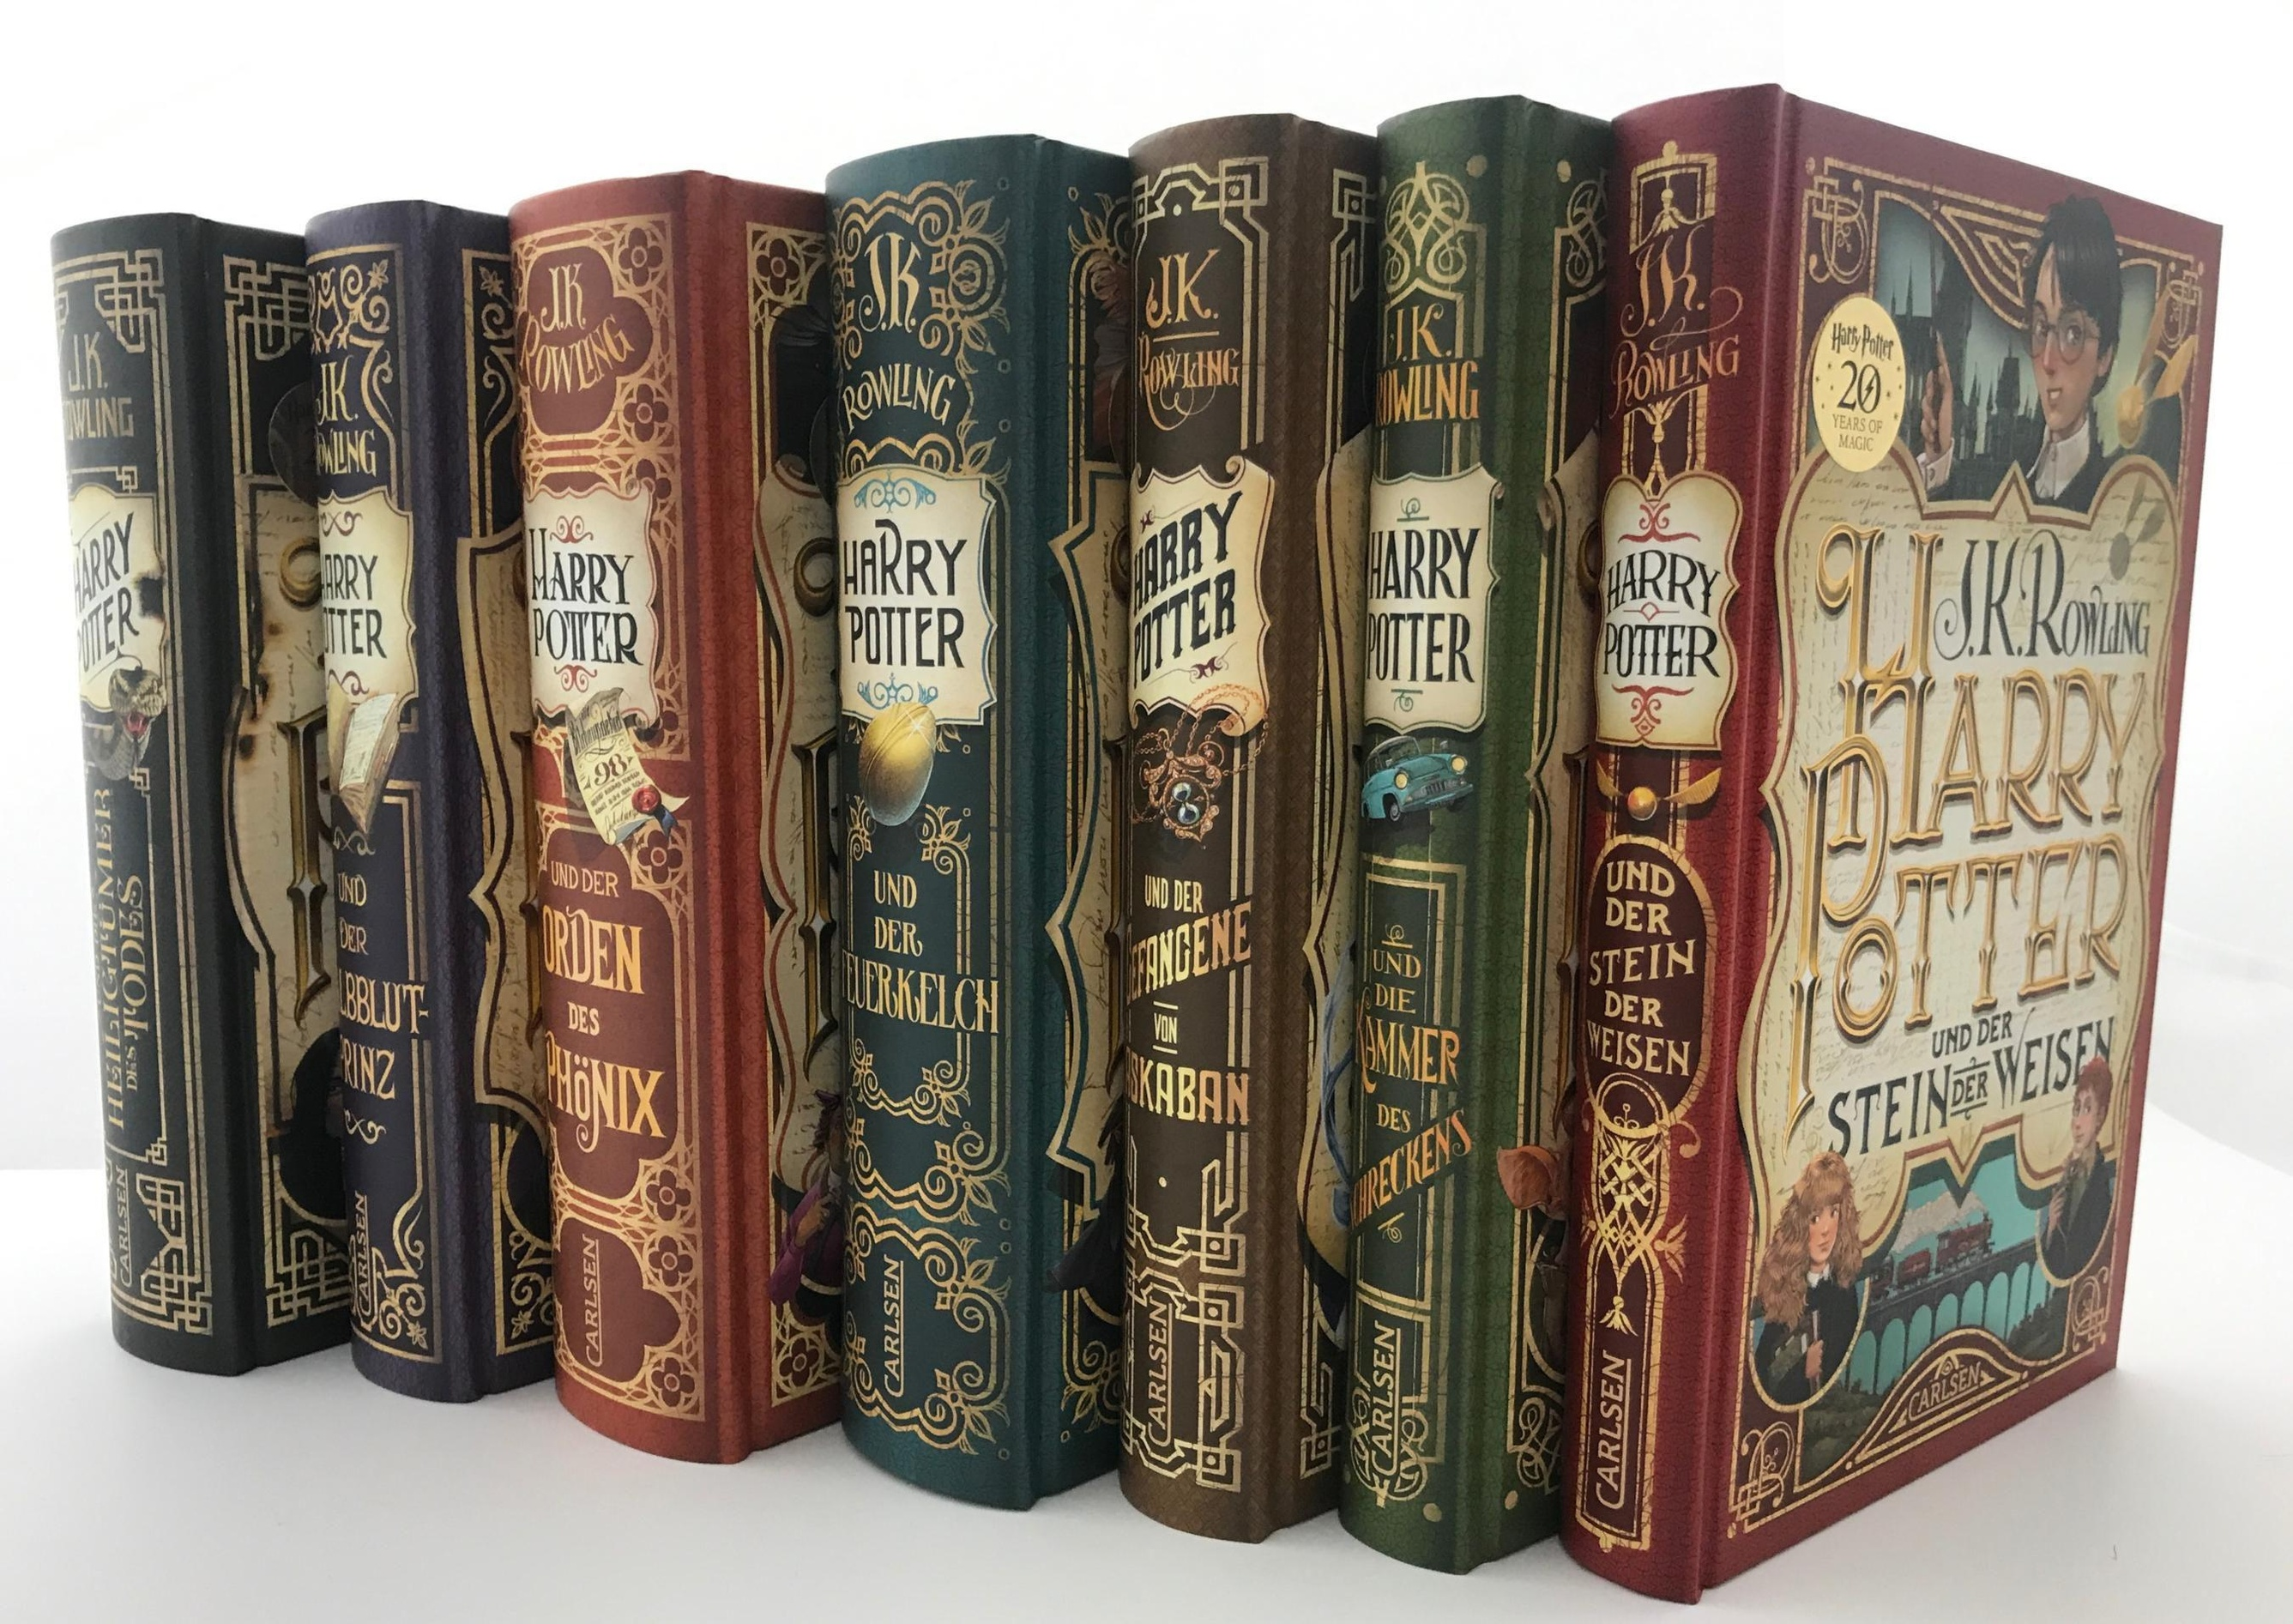 Harry Potter Und Der Halbblutprinz Harry Potter Jubilaum Bd 6 Buch